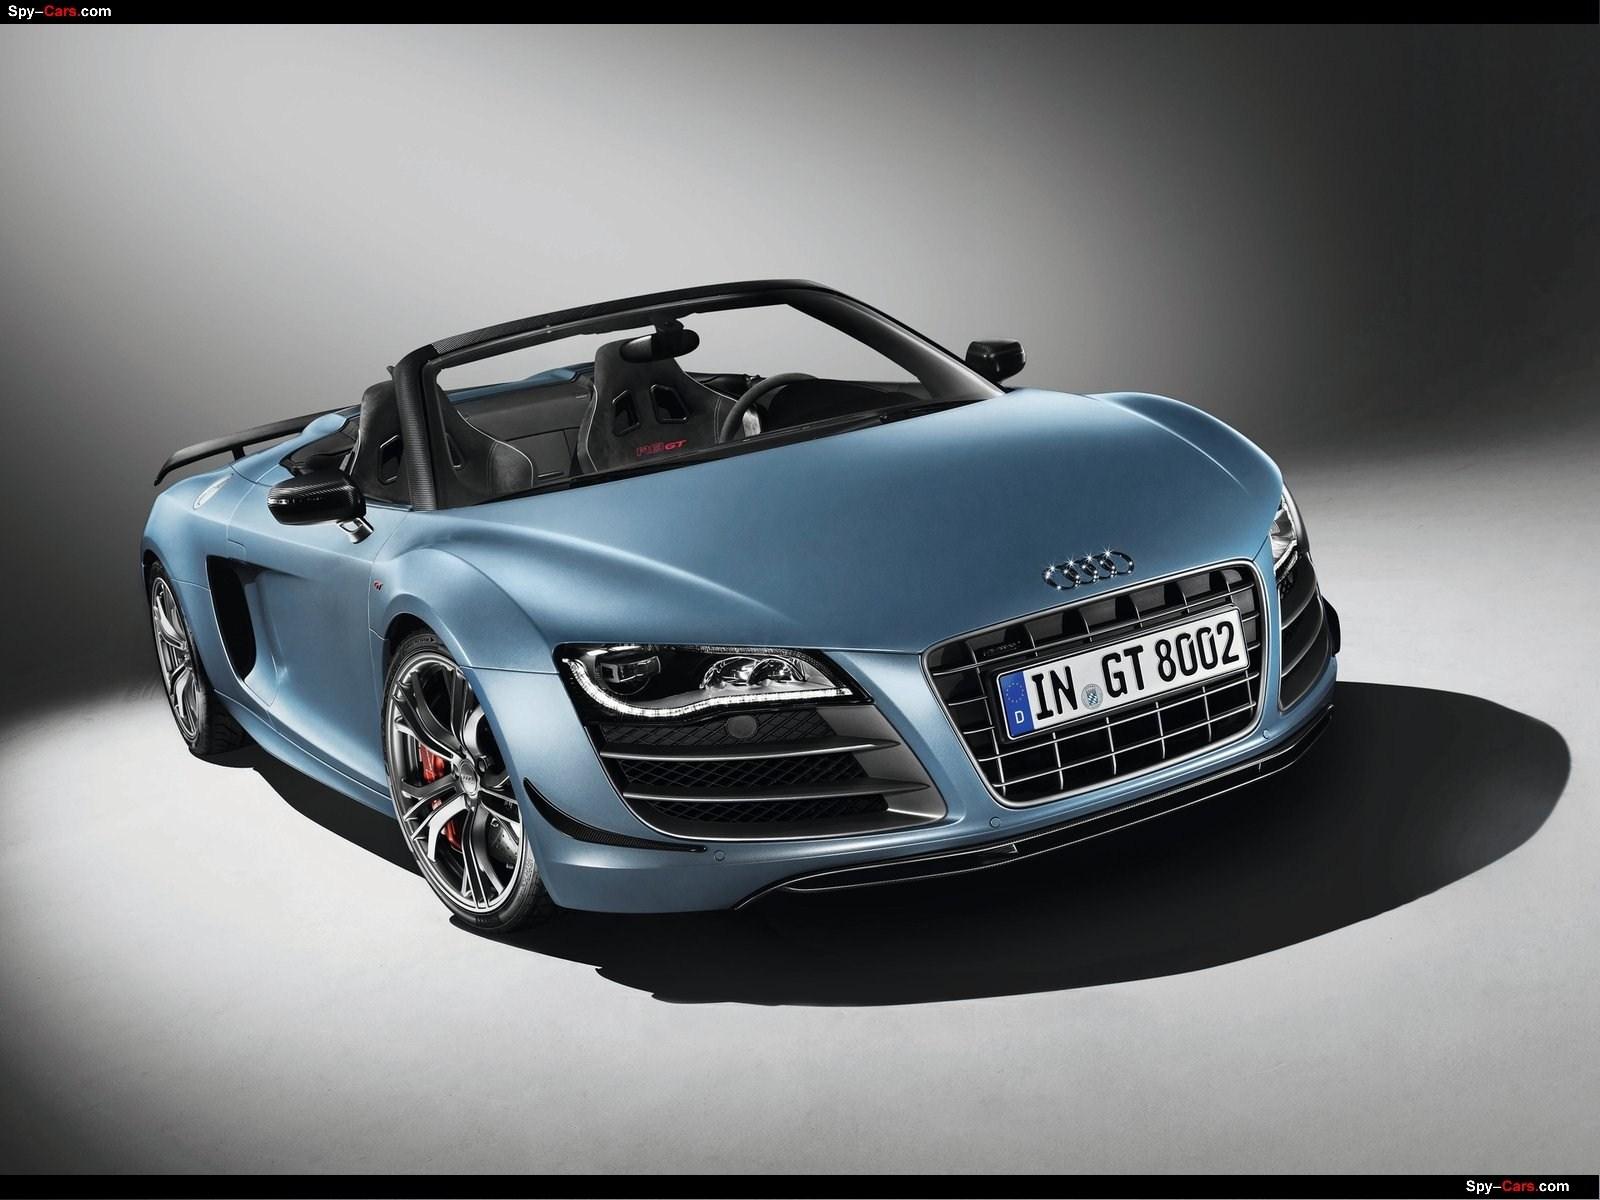 http://4.bp.blogspot.com/-Kvg69KcK13g/TeikwRtYlPI/AAAAAAAAOo8/0MZYAnkXnrY/s1600/Audi-R8_GT_Spyder_2012_1600x1200_001.jpg